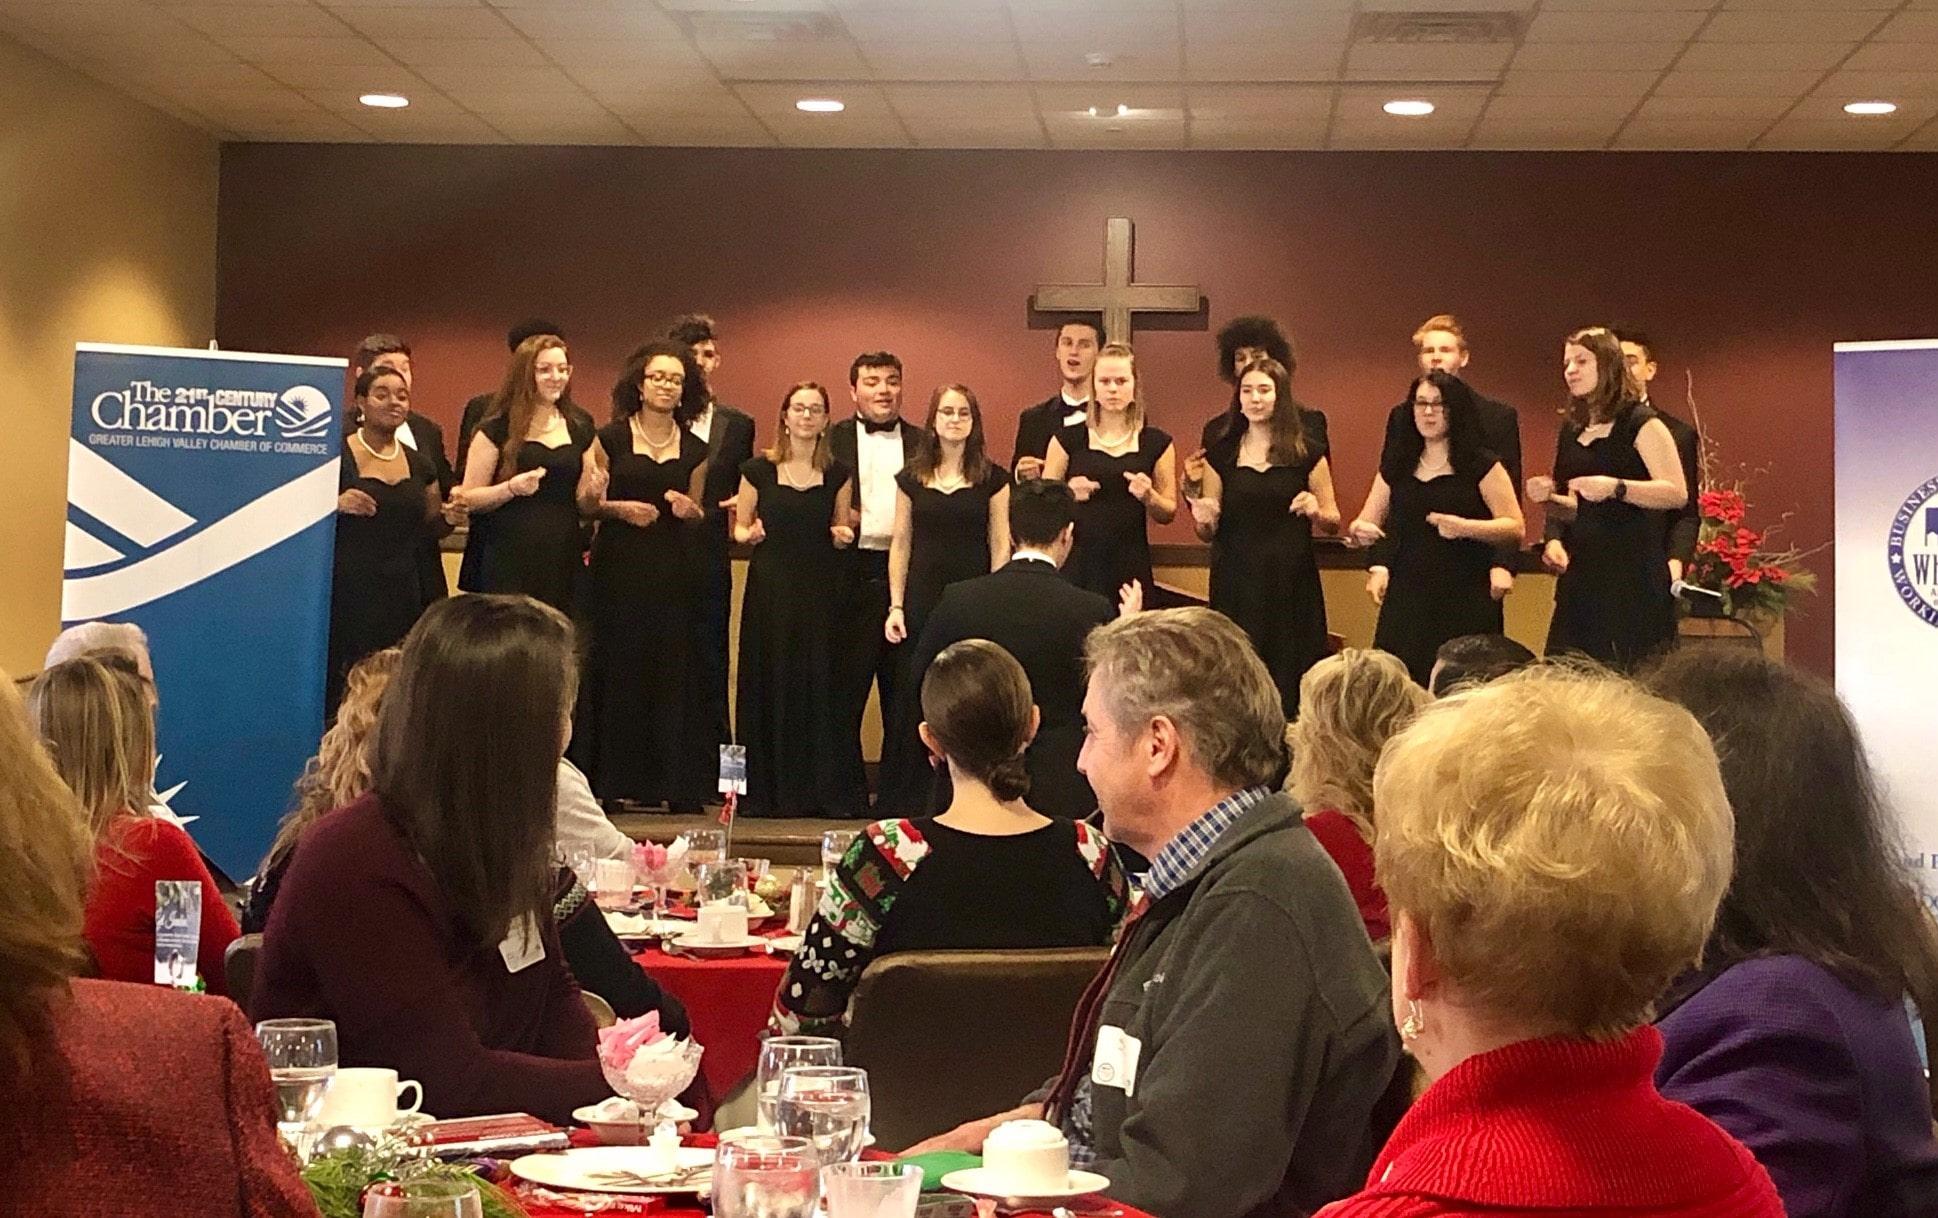 The holiday luncheon choir